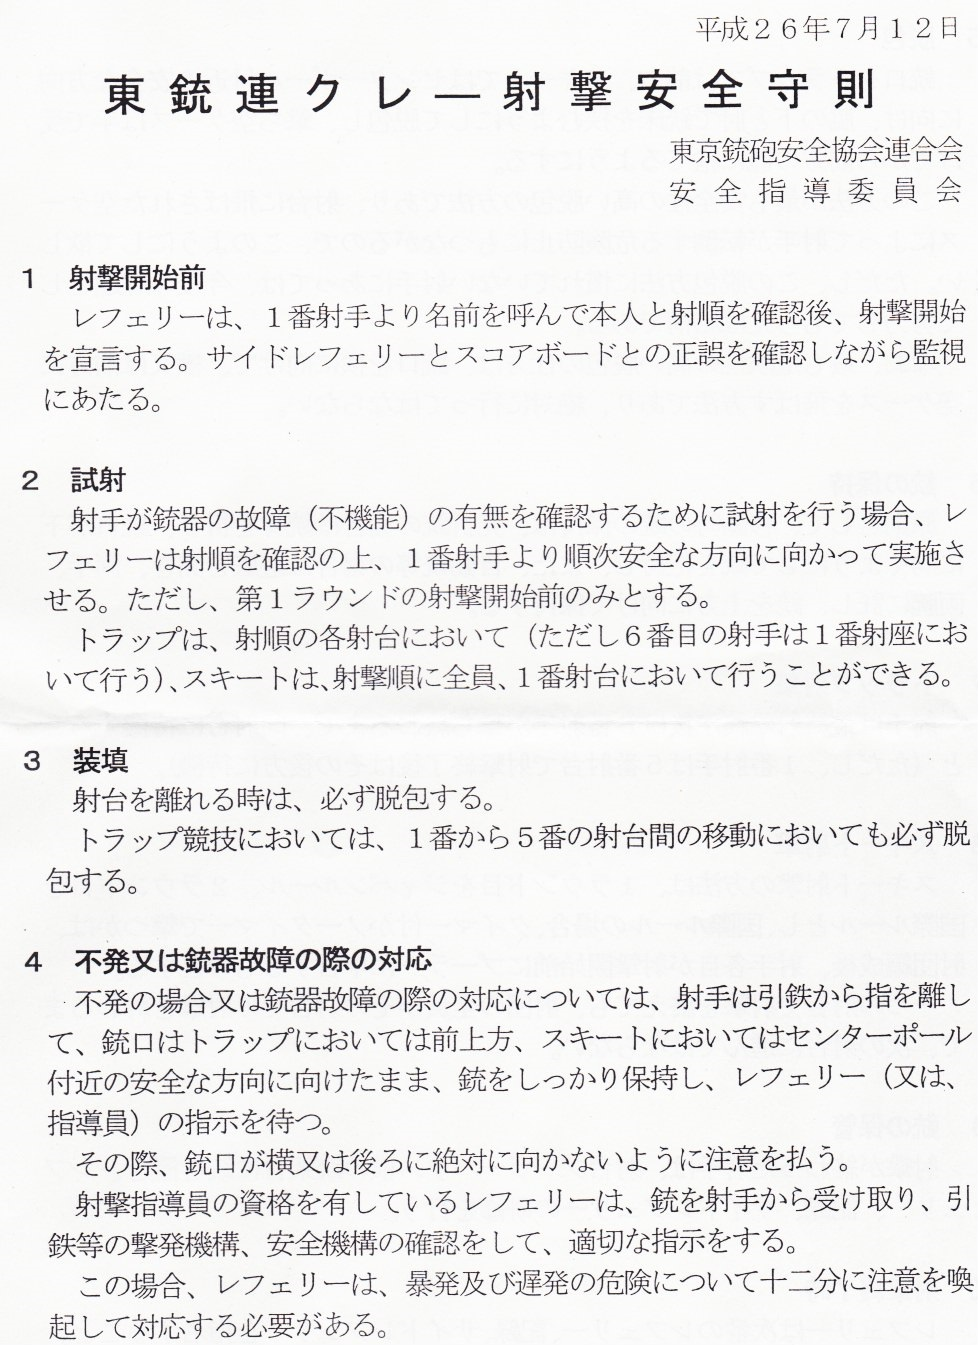 a0301751_20112.jpg